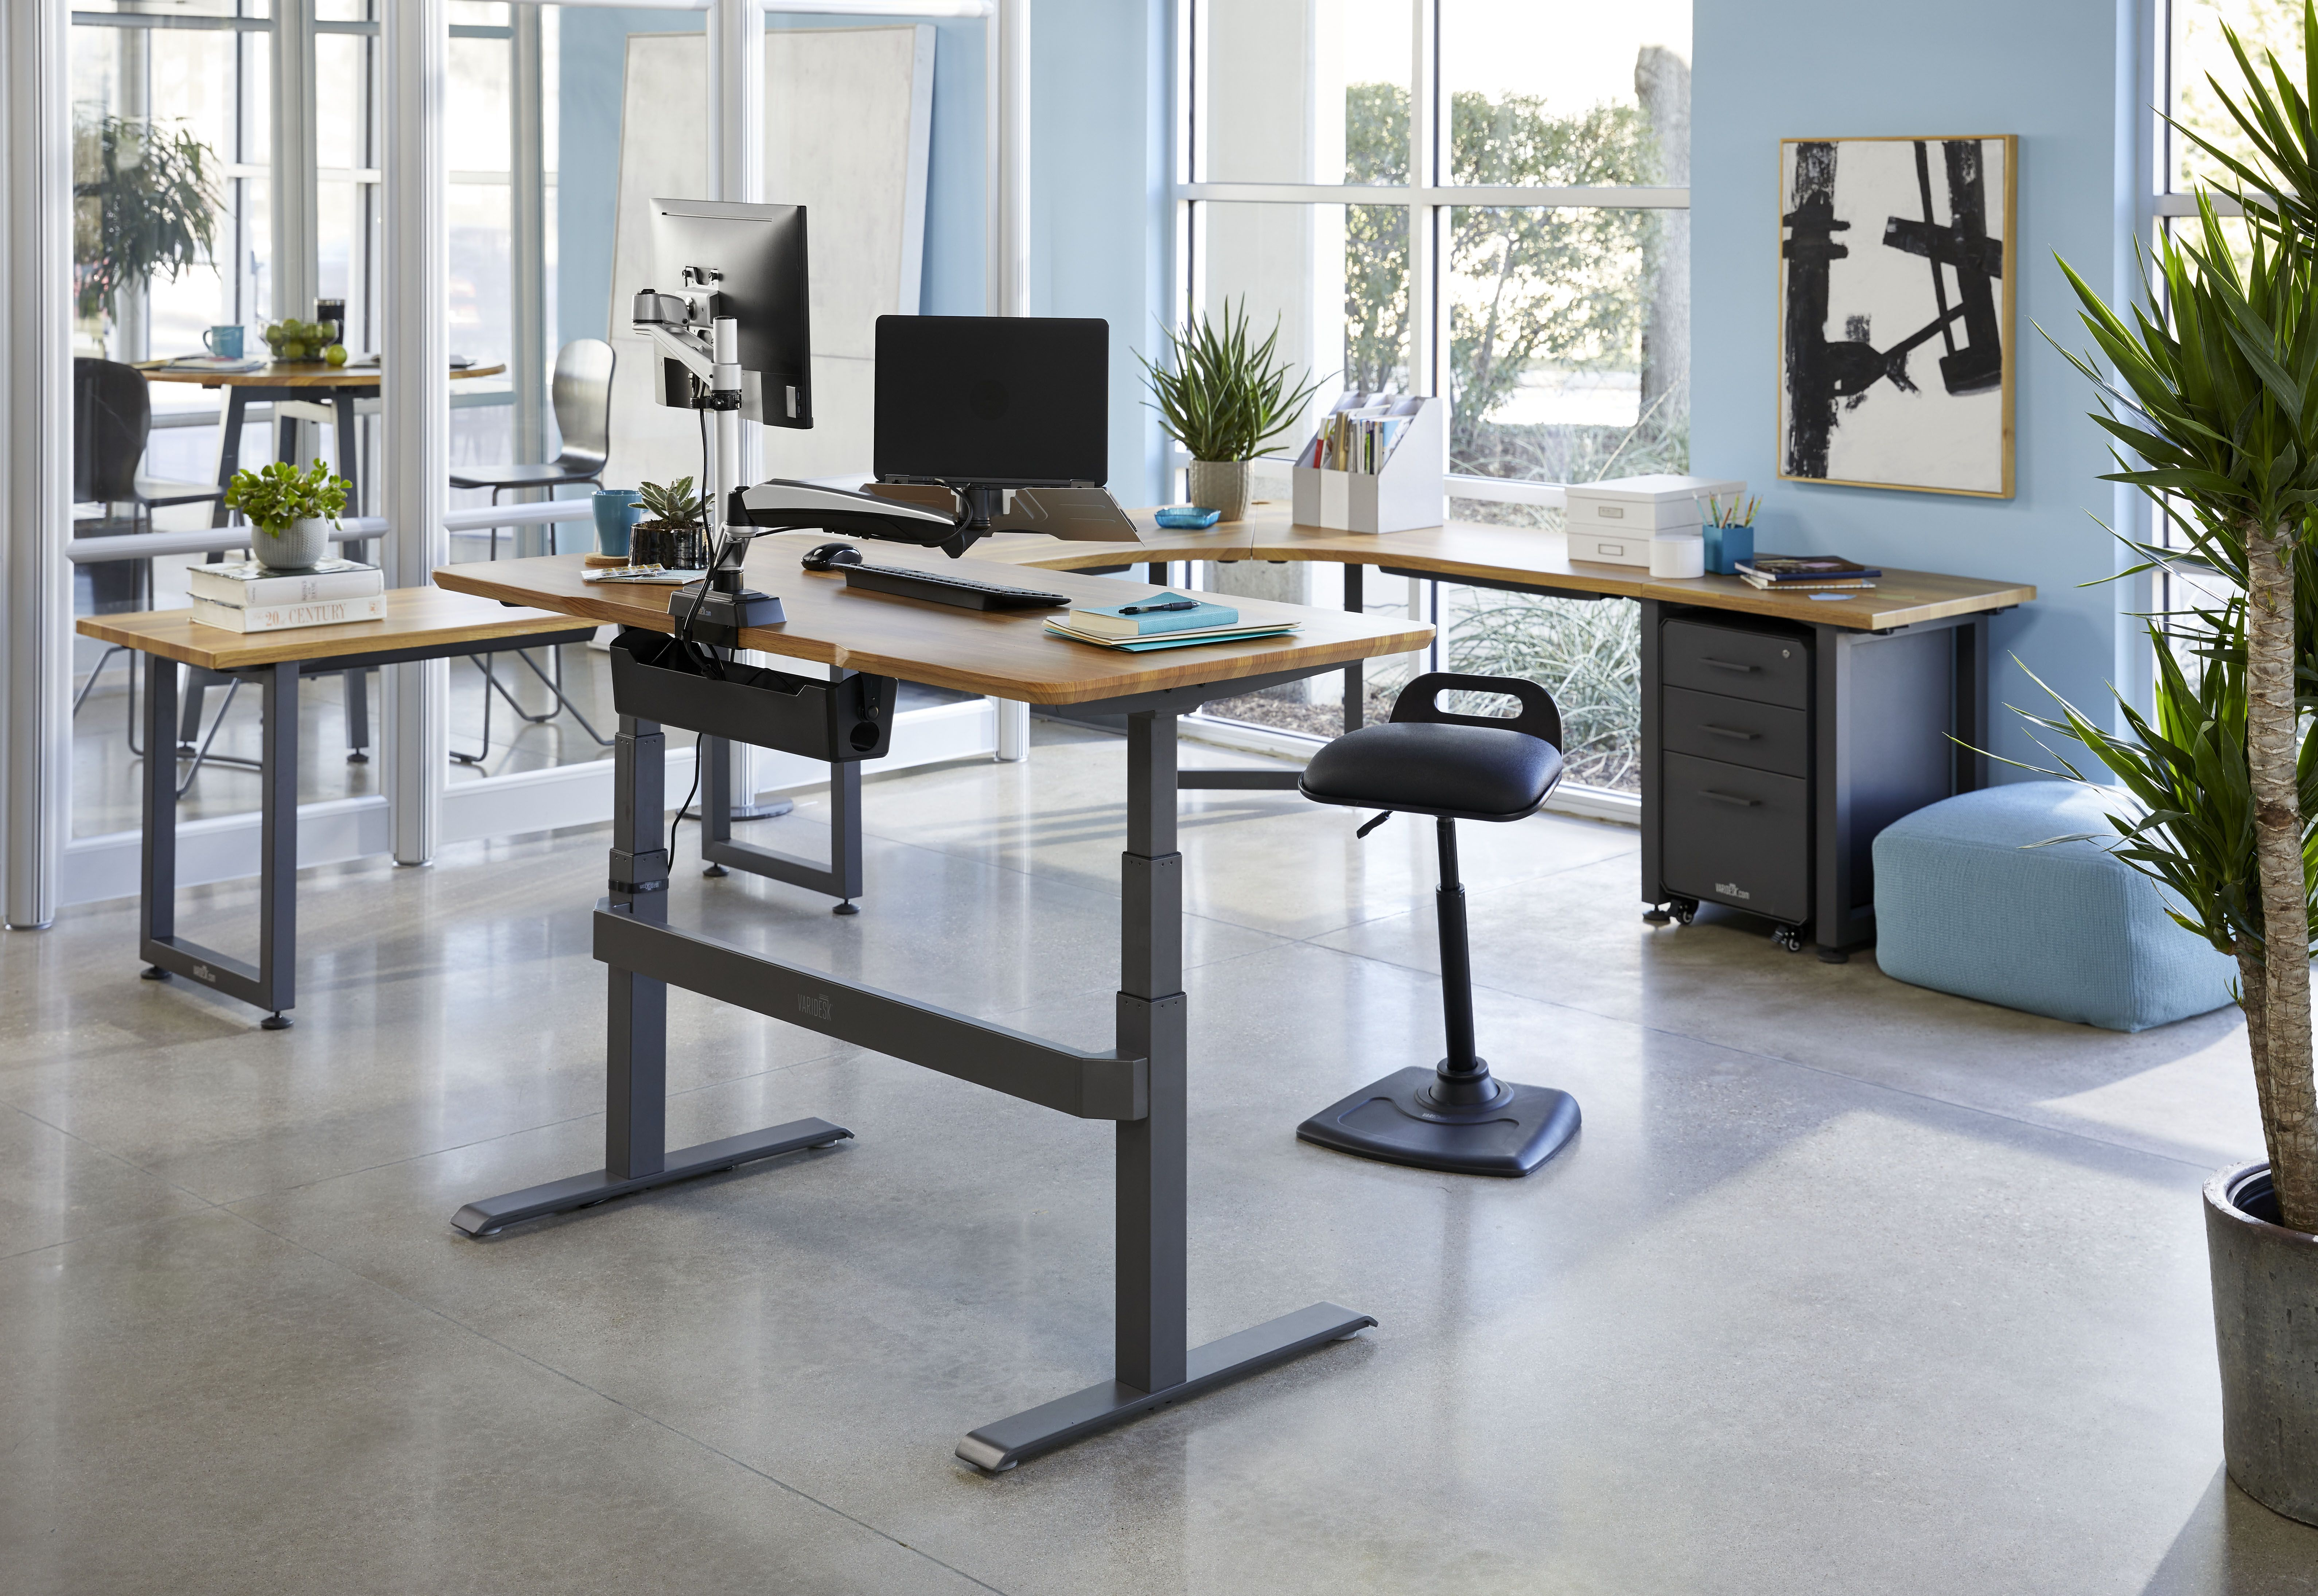 Flexible Office Design Standing Desk Inspiration Desk Inspiration Redesign Furniture Workspace Inspiration